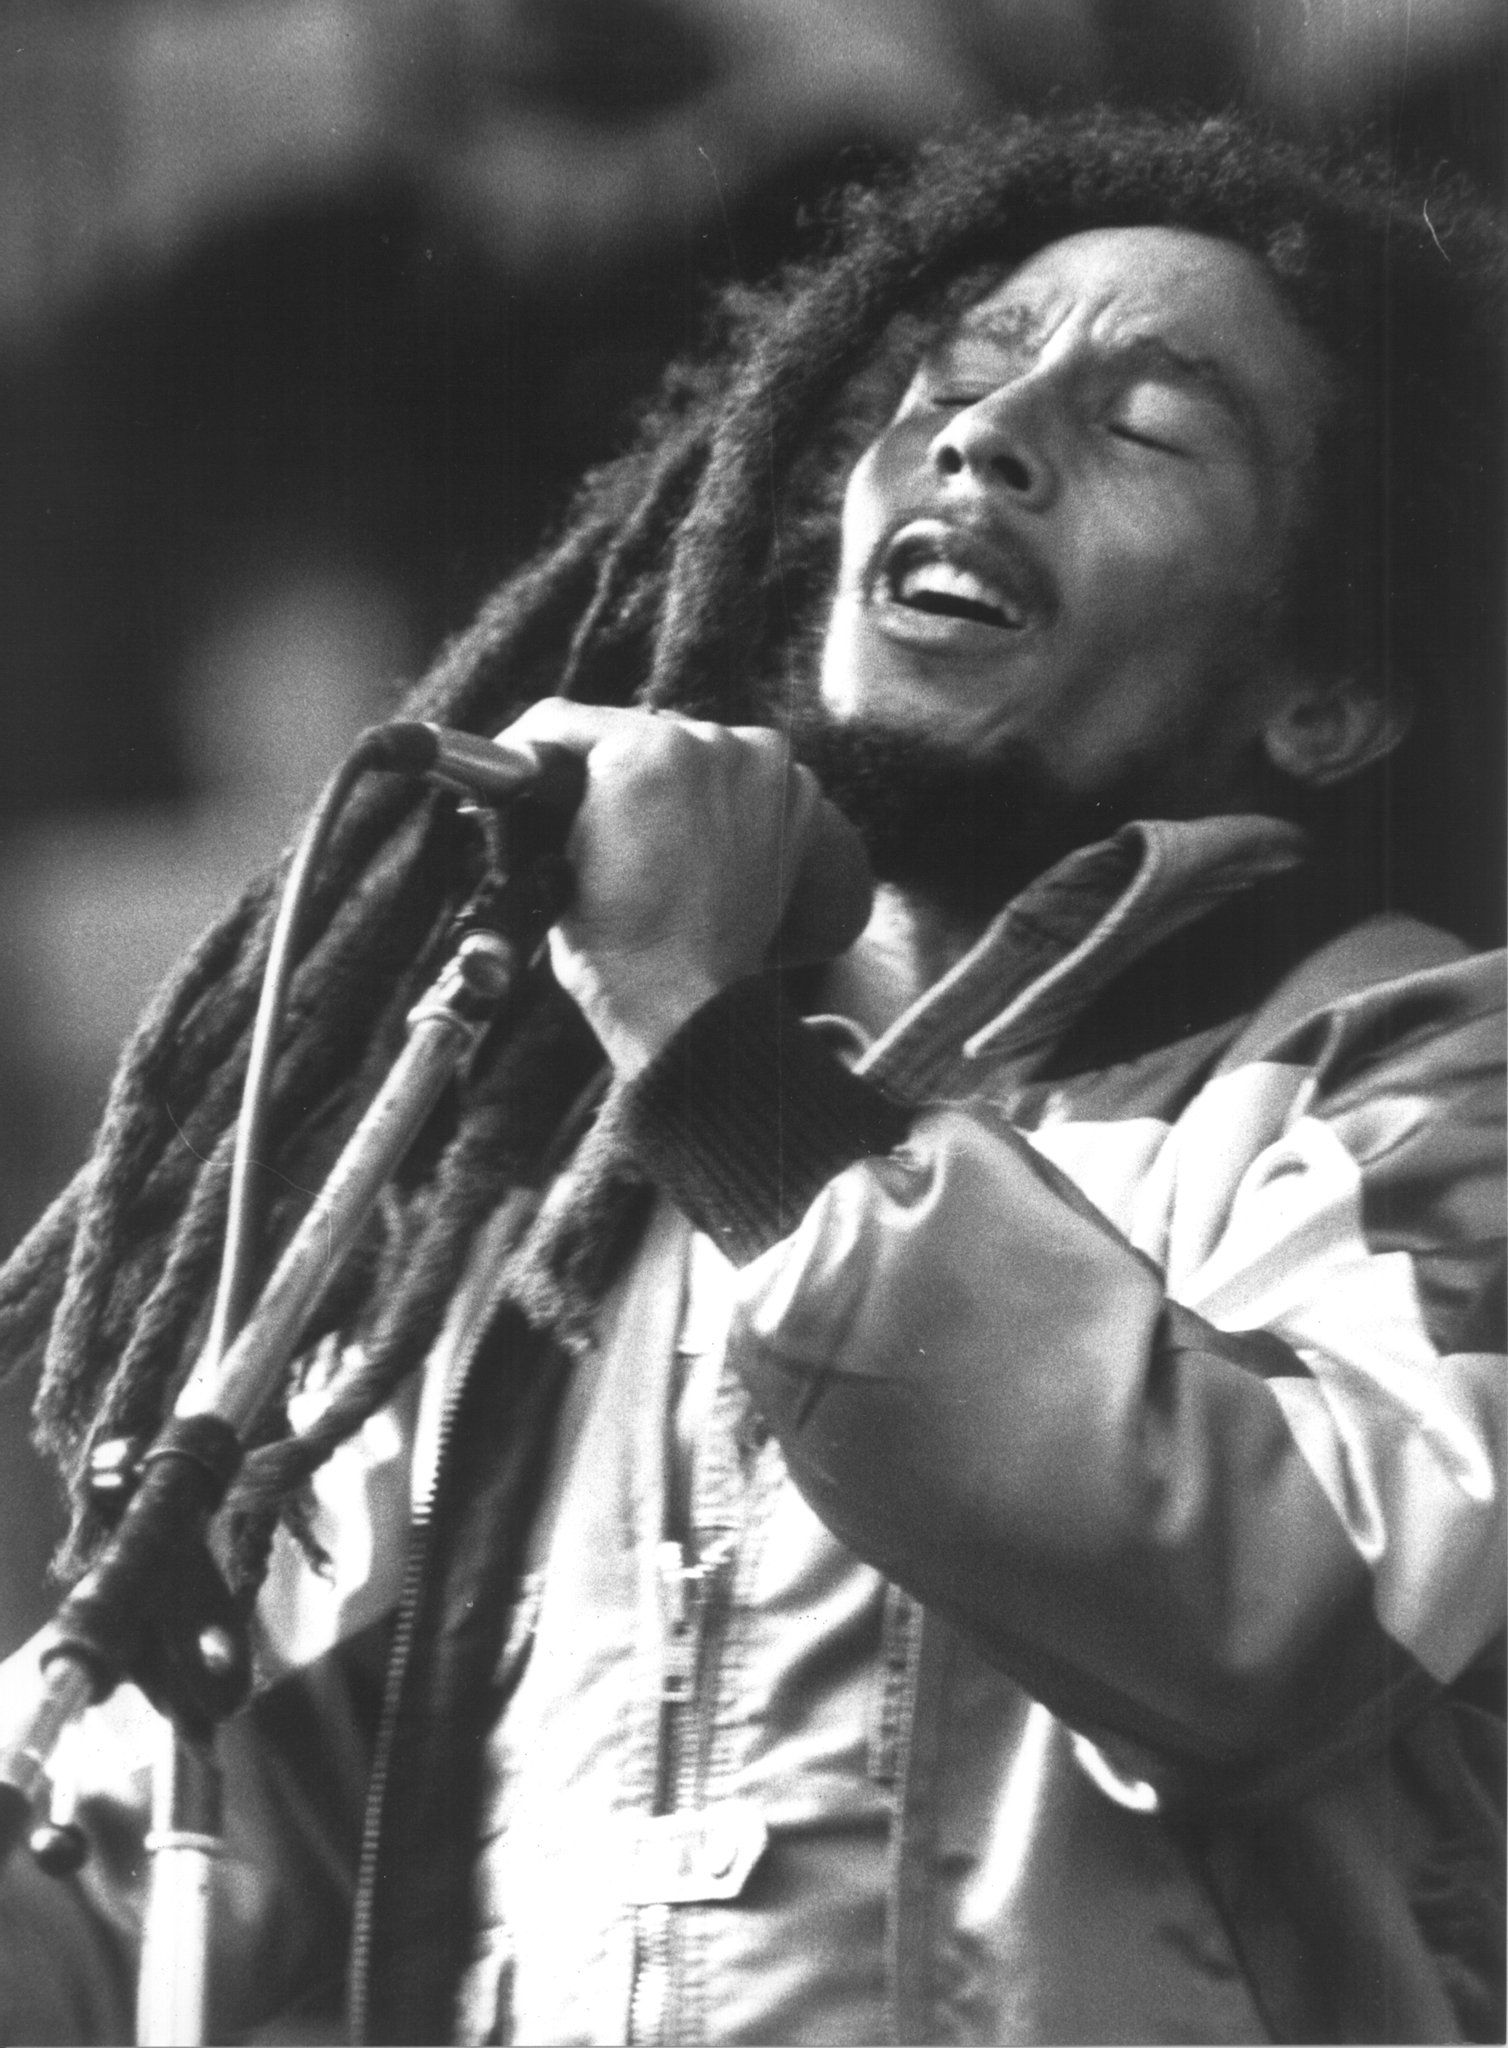 Retro/ Bob Marley